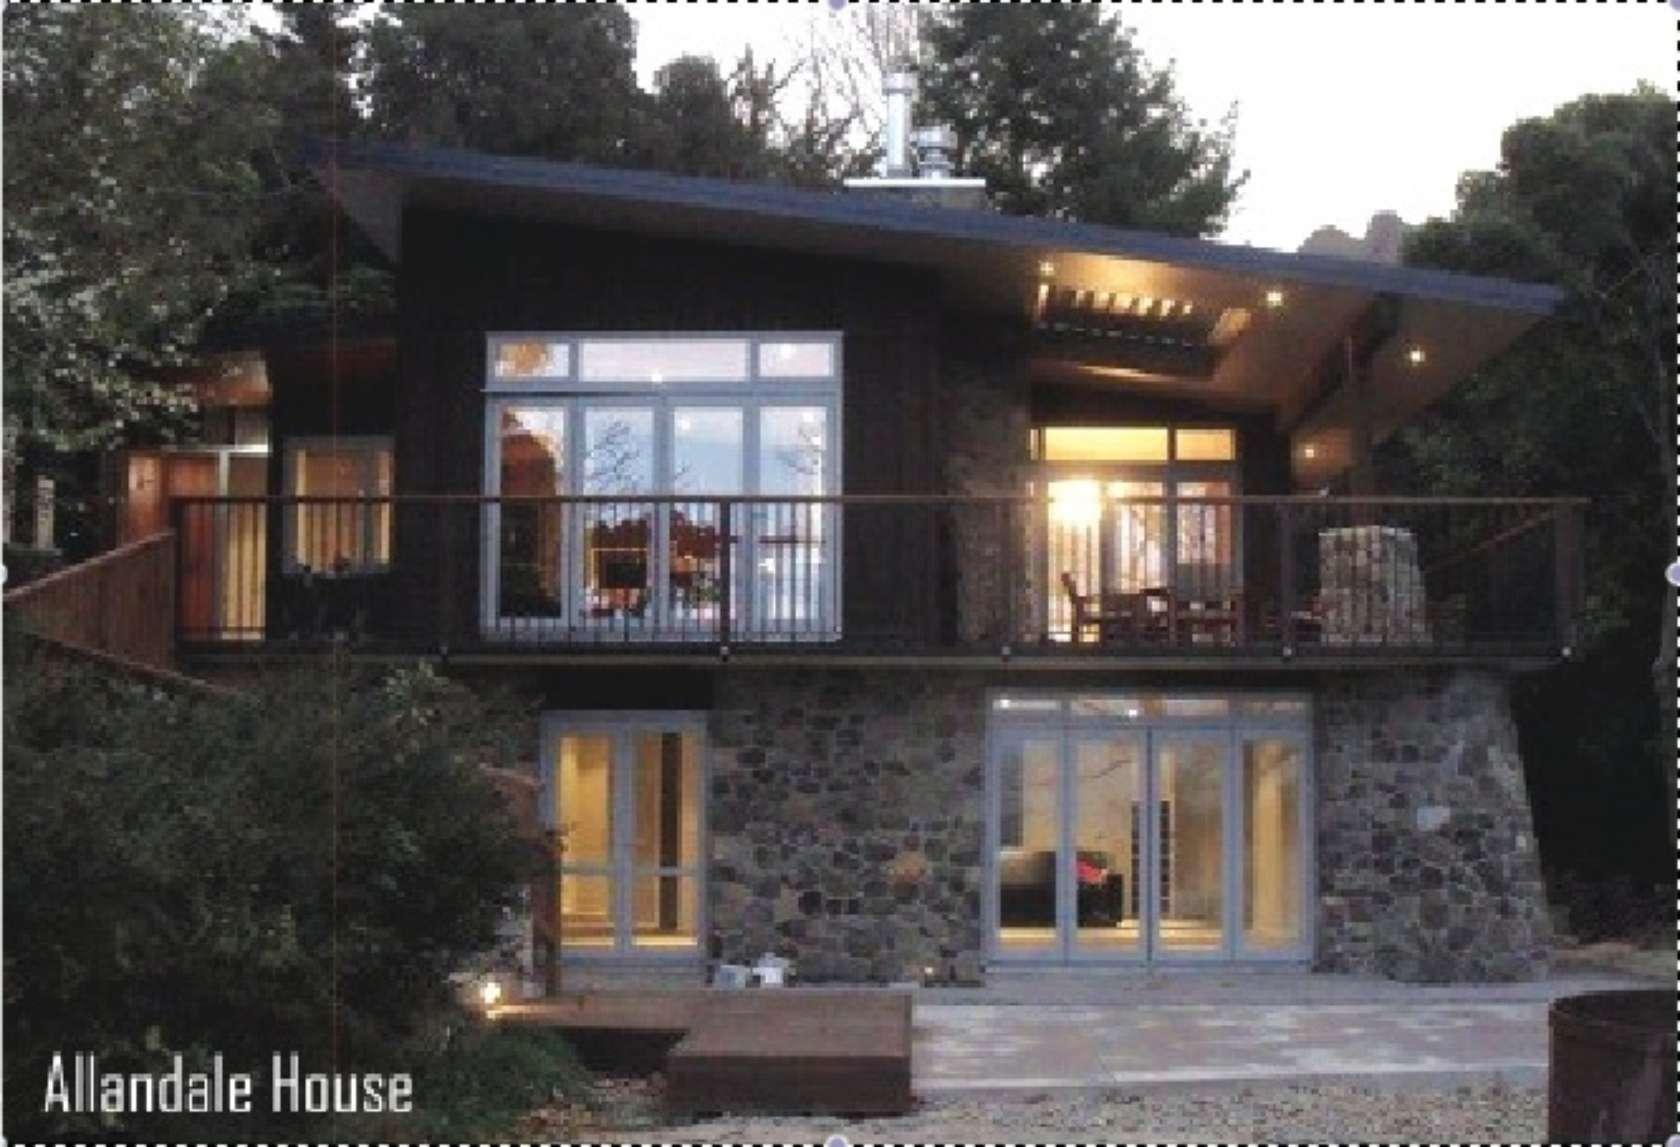 Allandale house architizer for Allandale house